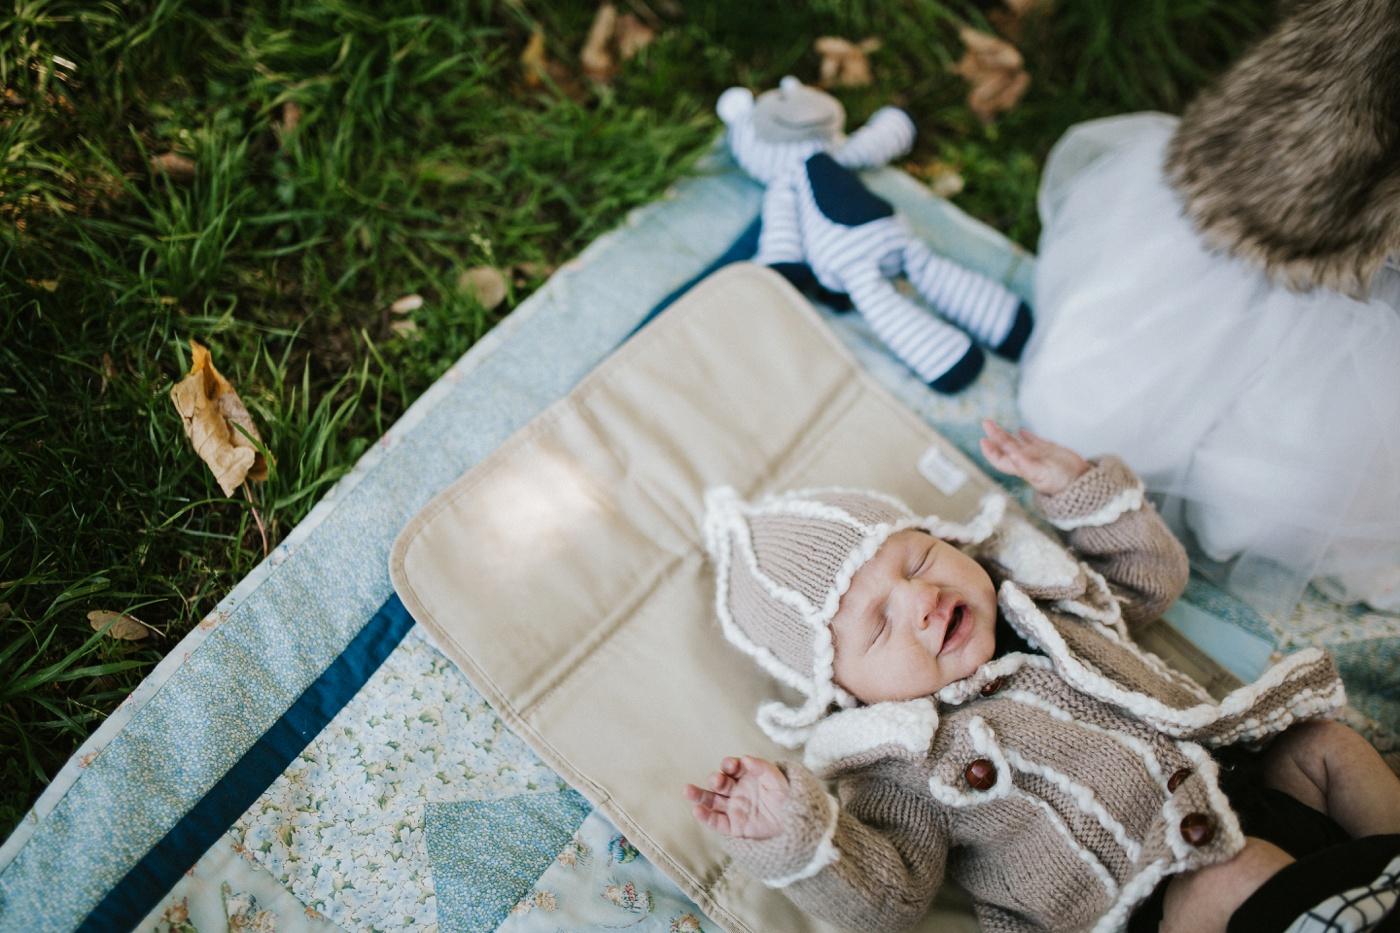 Blake-Lily-Rolig-Lekfull-Familjesession-Familjefotograf-Stockholm-Orebro_07